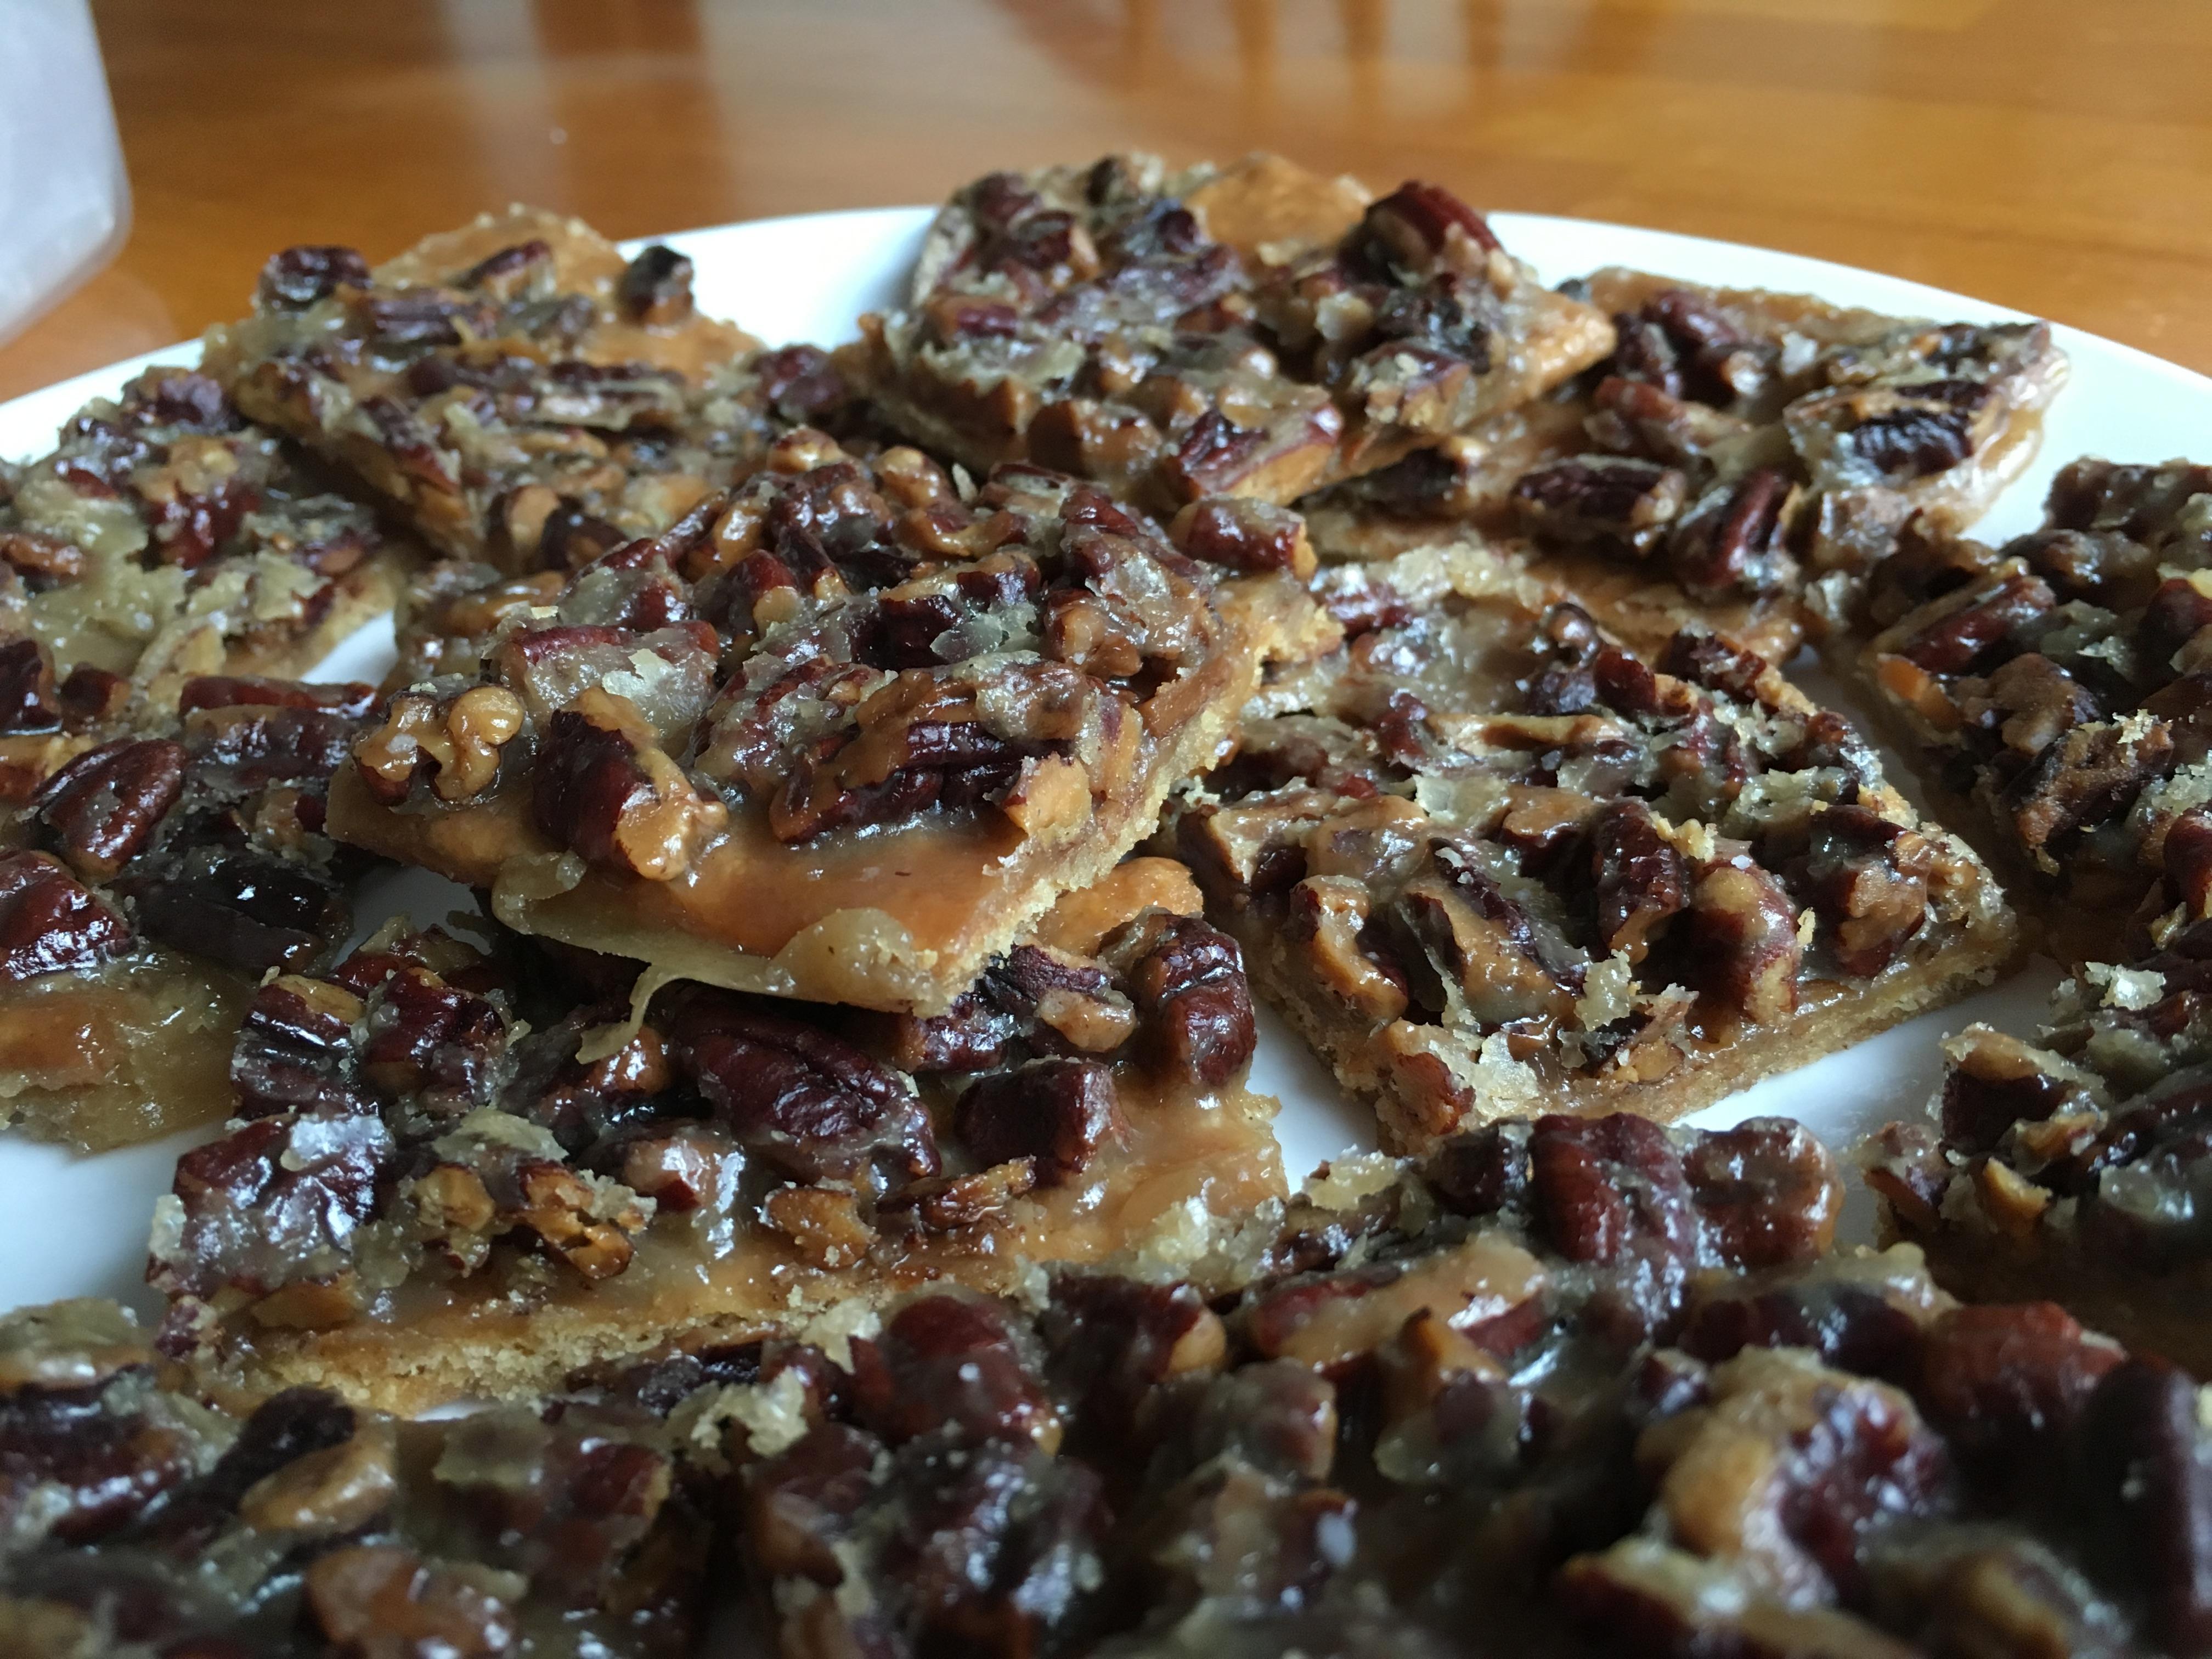 Mary's Salted Caramel-Pecan Bars